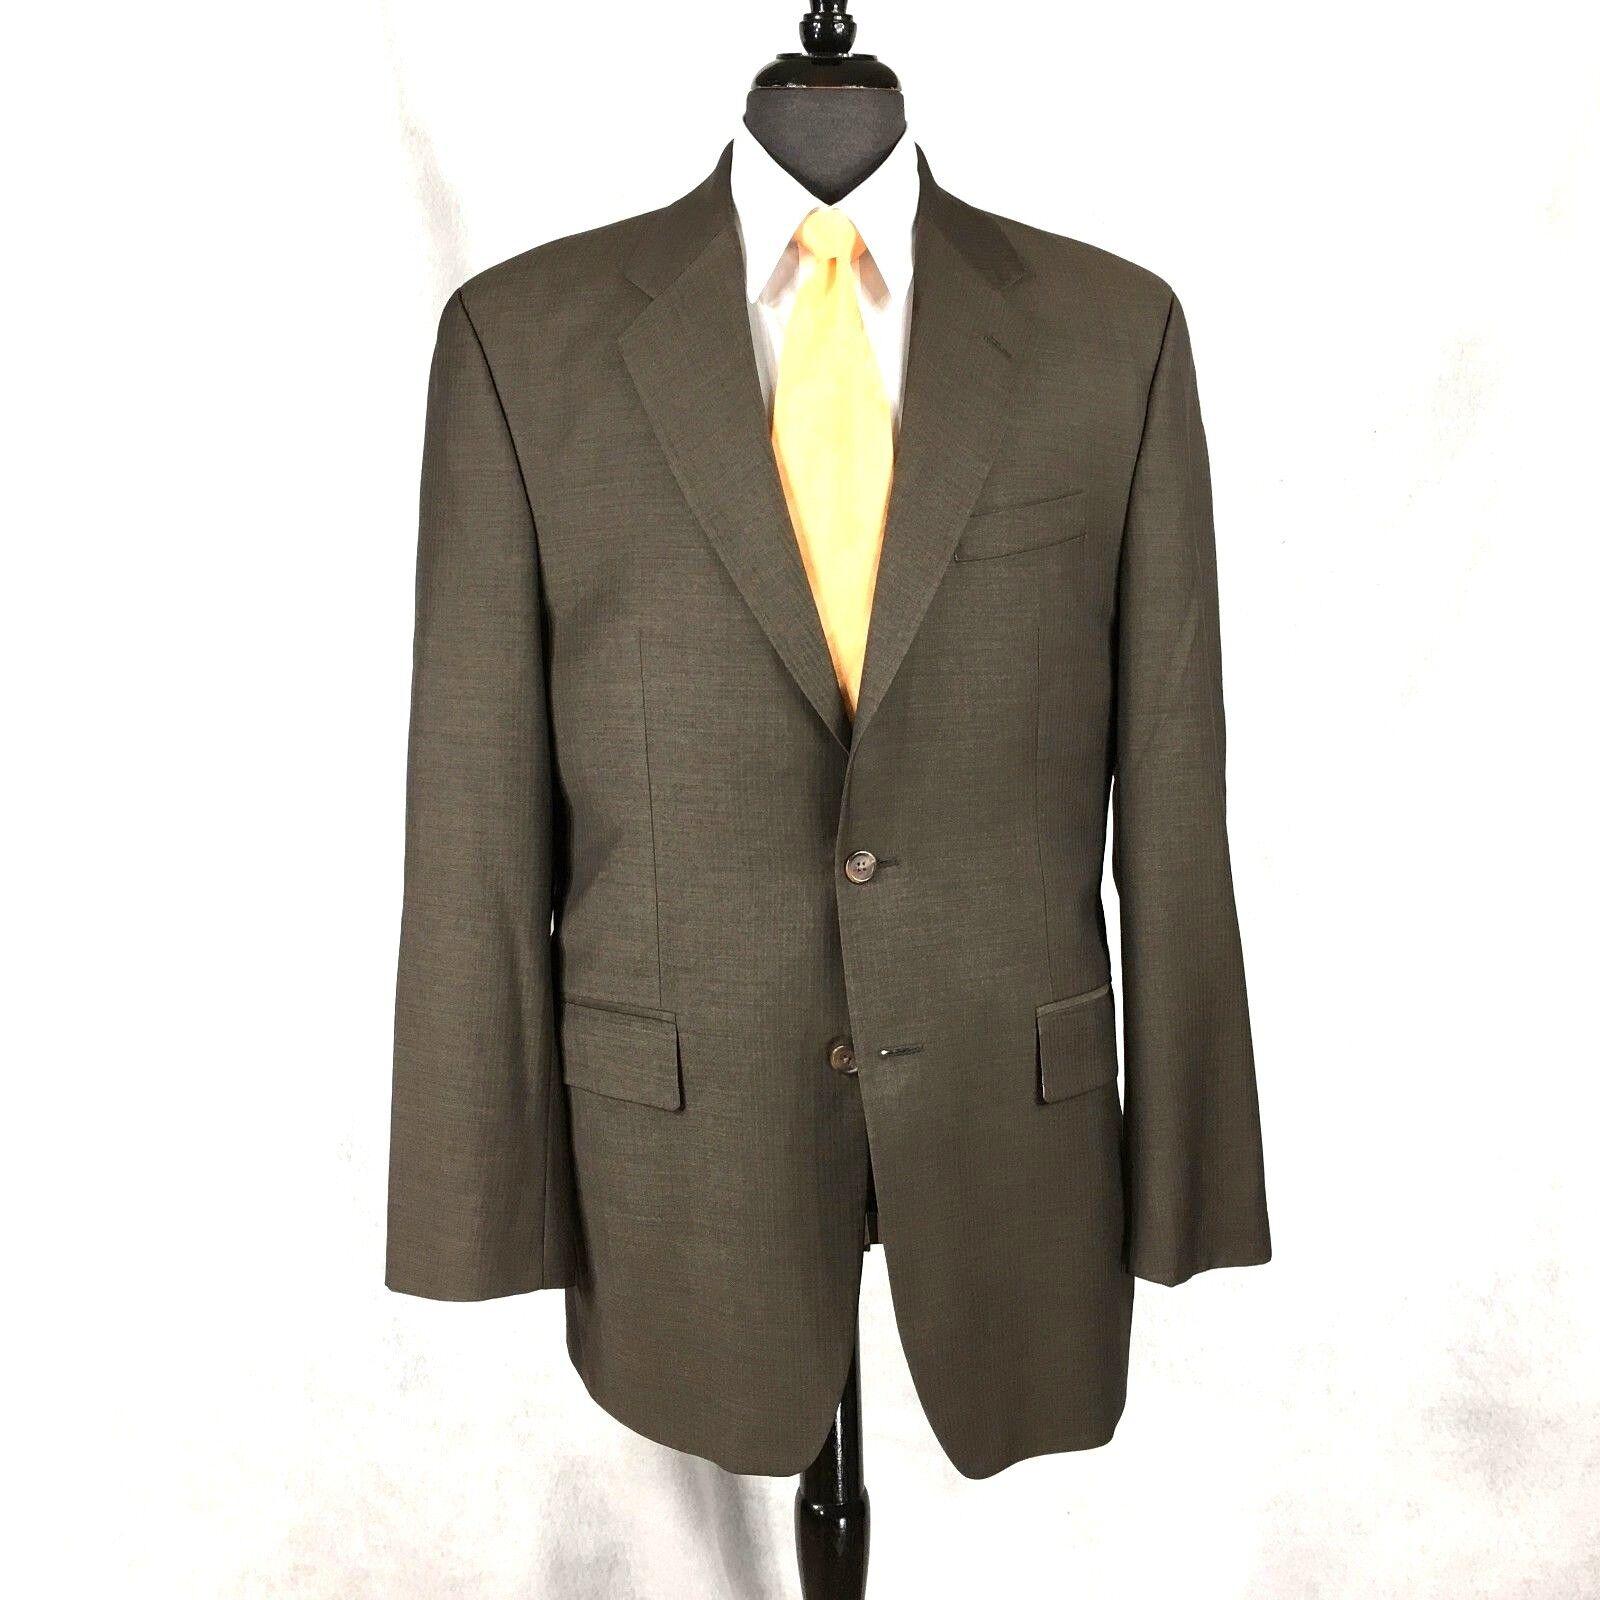 Chaps Ralph Lauren mens Braun Herringbone wool cashmere blazer jkt 40L to 42L